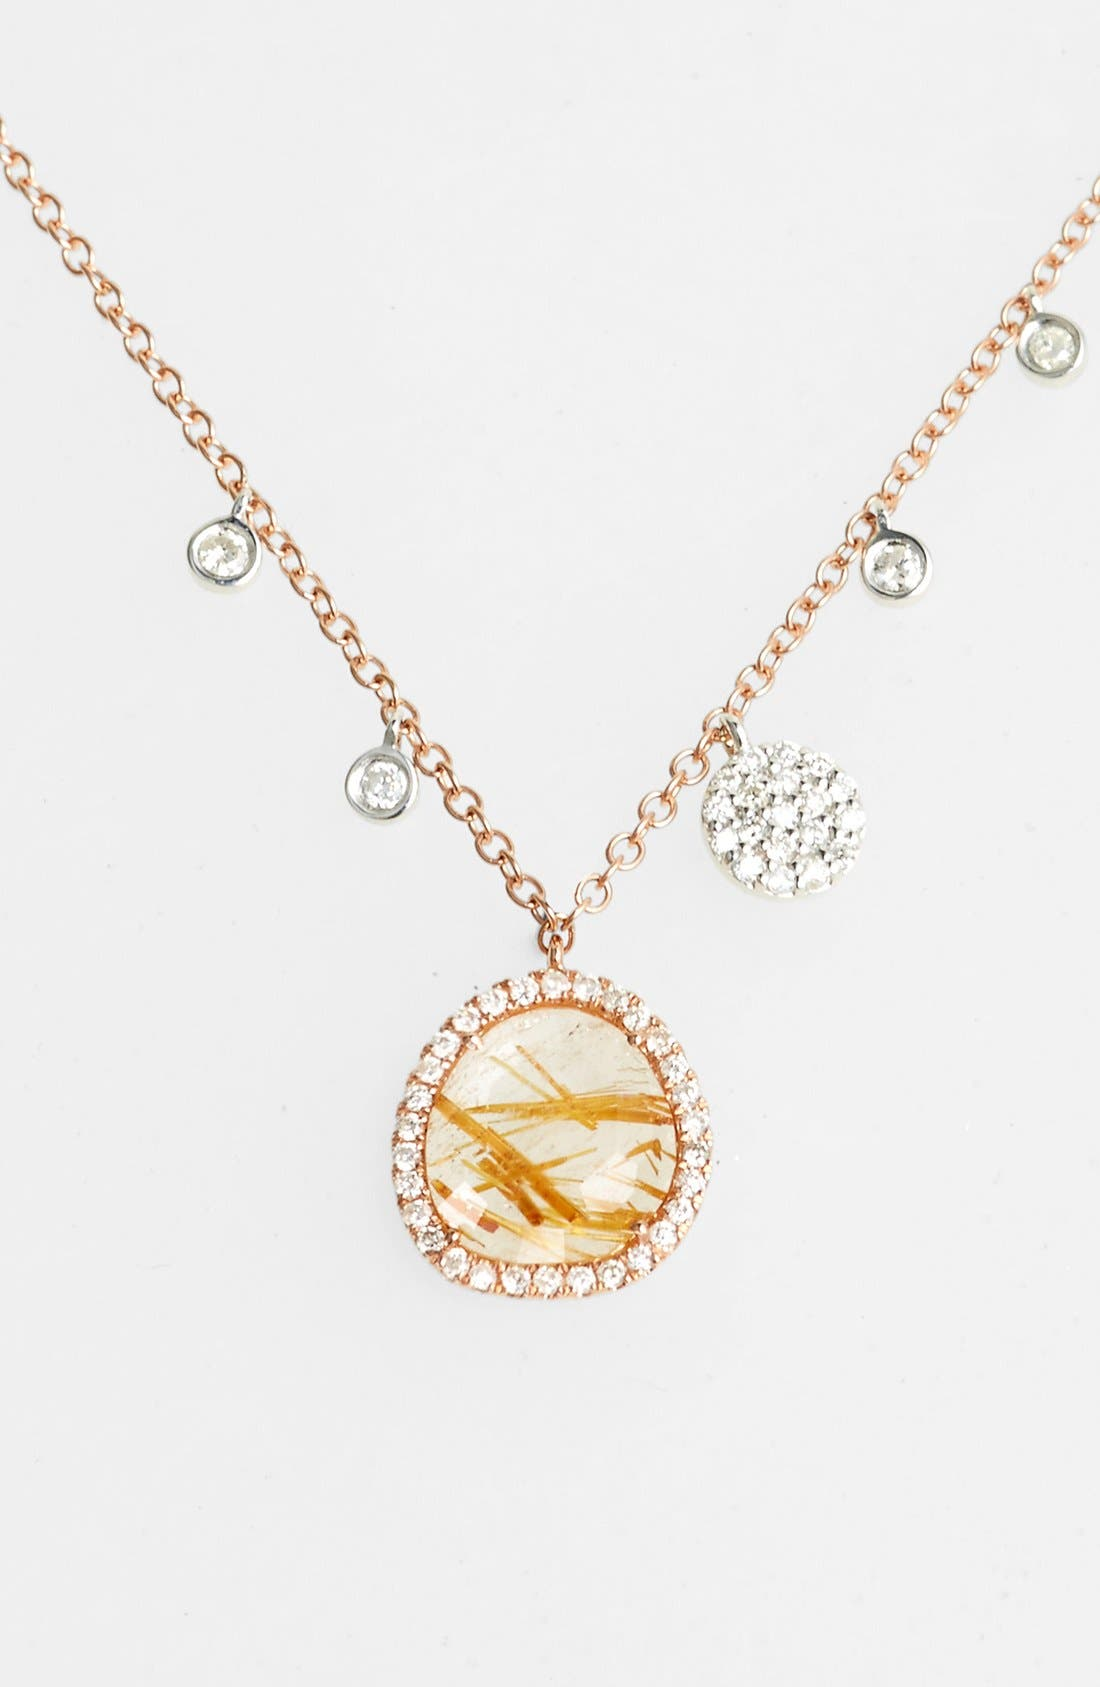 Main Image - MeiraT 'Rough Cut' Stone & Diamond Pendant Necklace